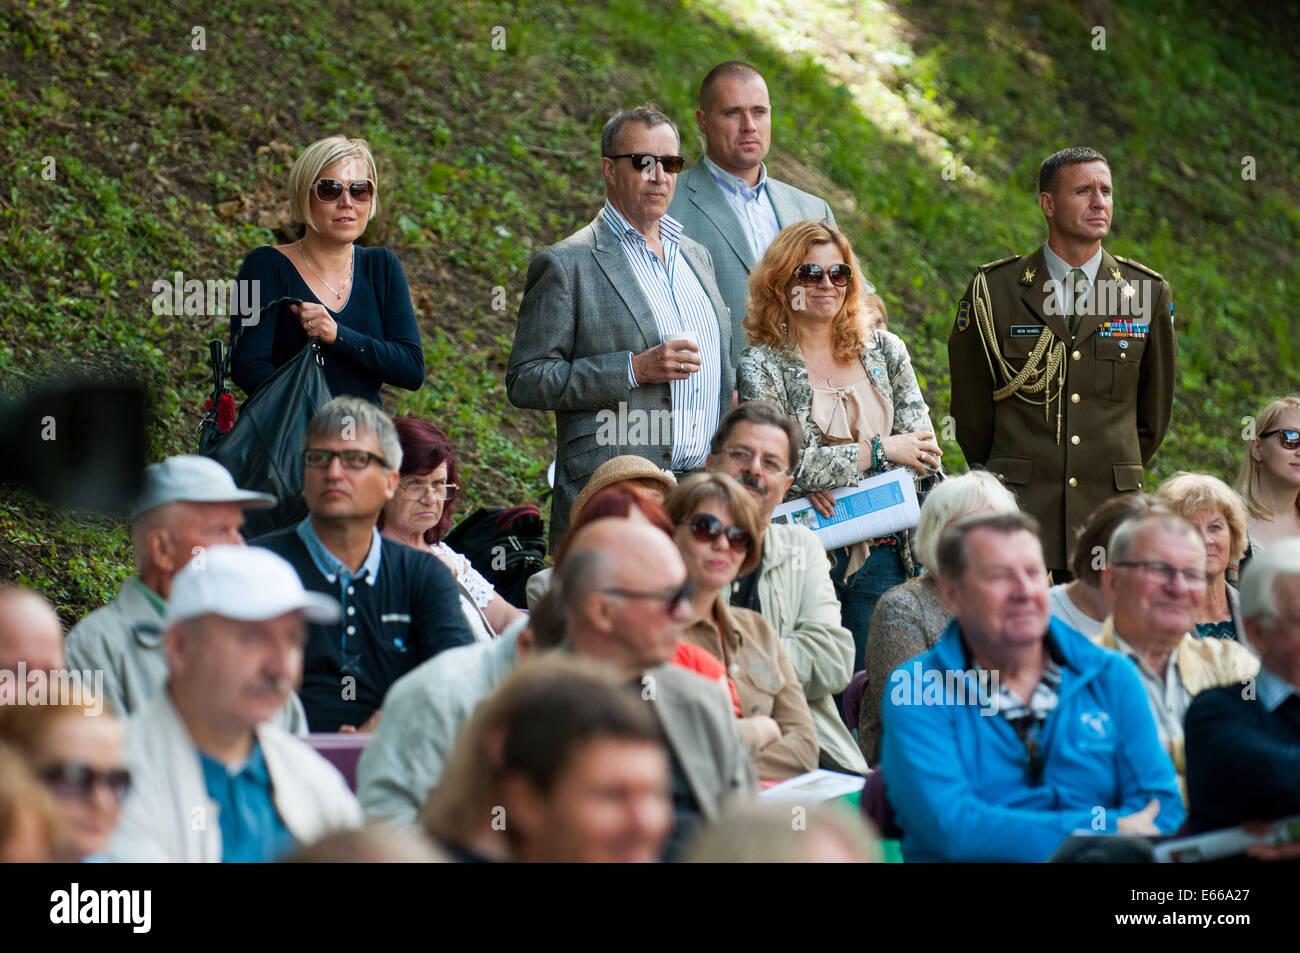 Paide, Estonia. 15th Aug, 2014. Estonian President Toomas Hendrik Ilves (C, rear) joins the Festival of Opinion - Stock Image